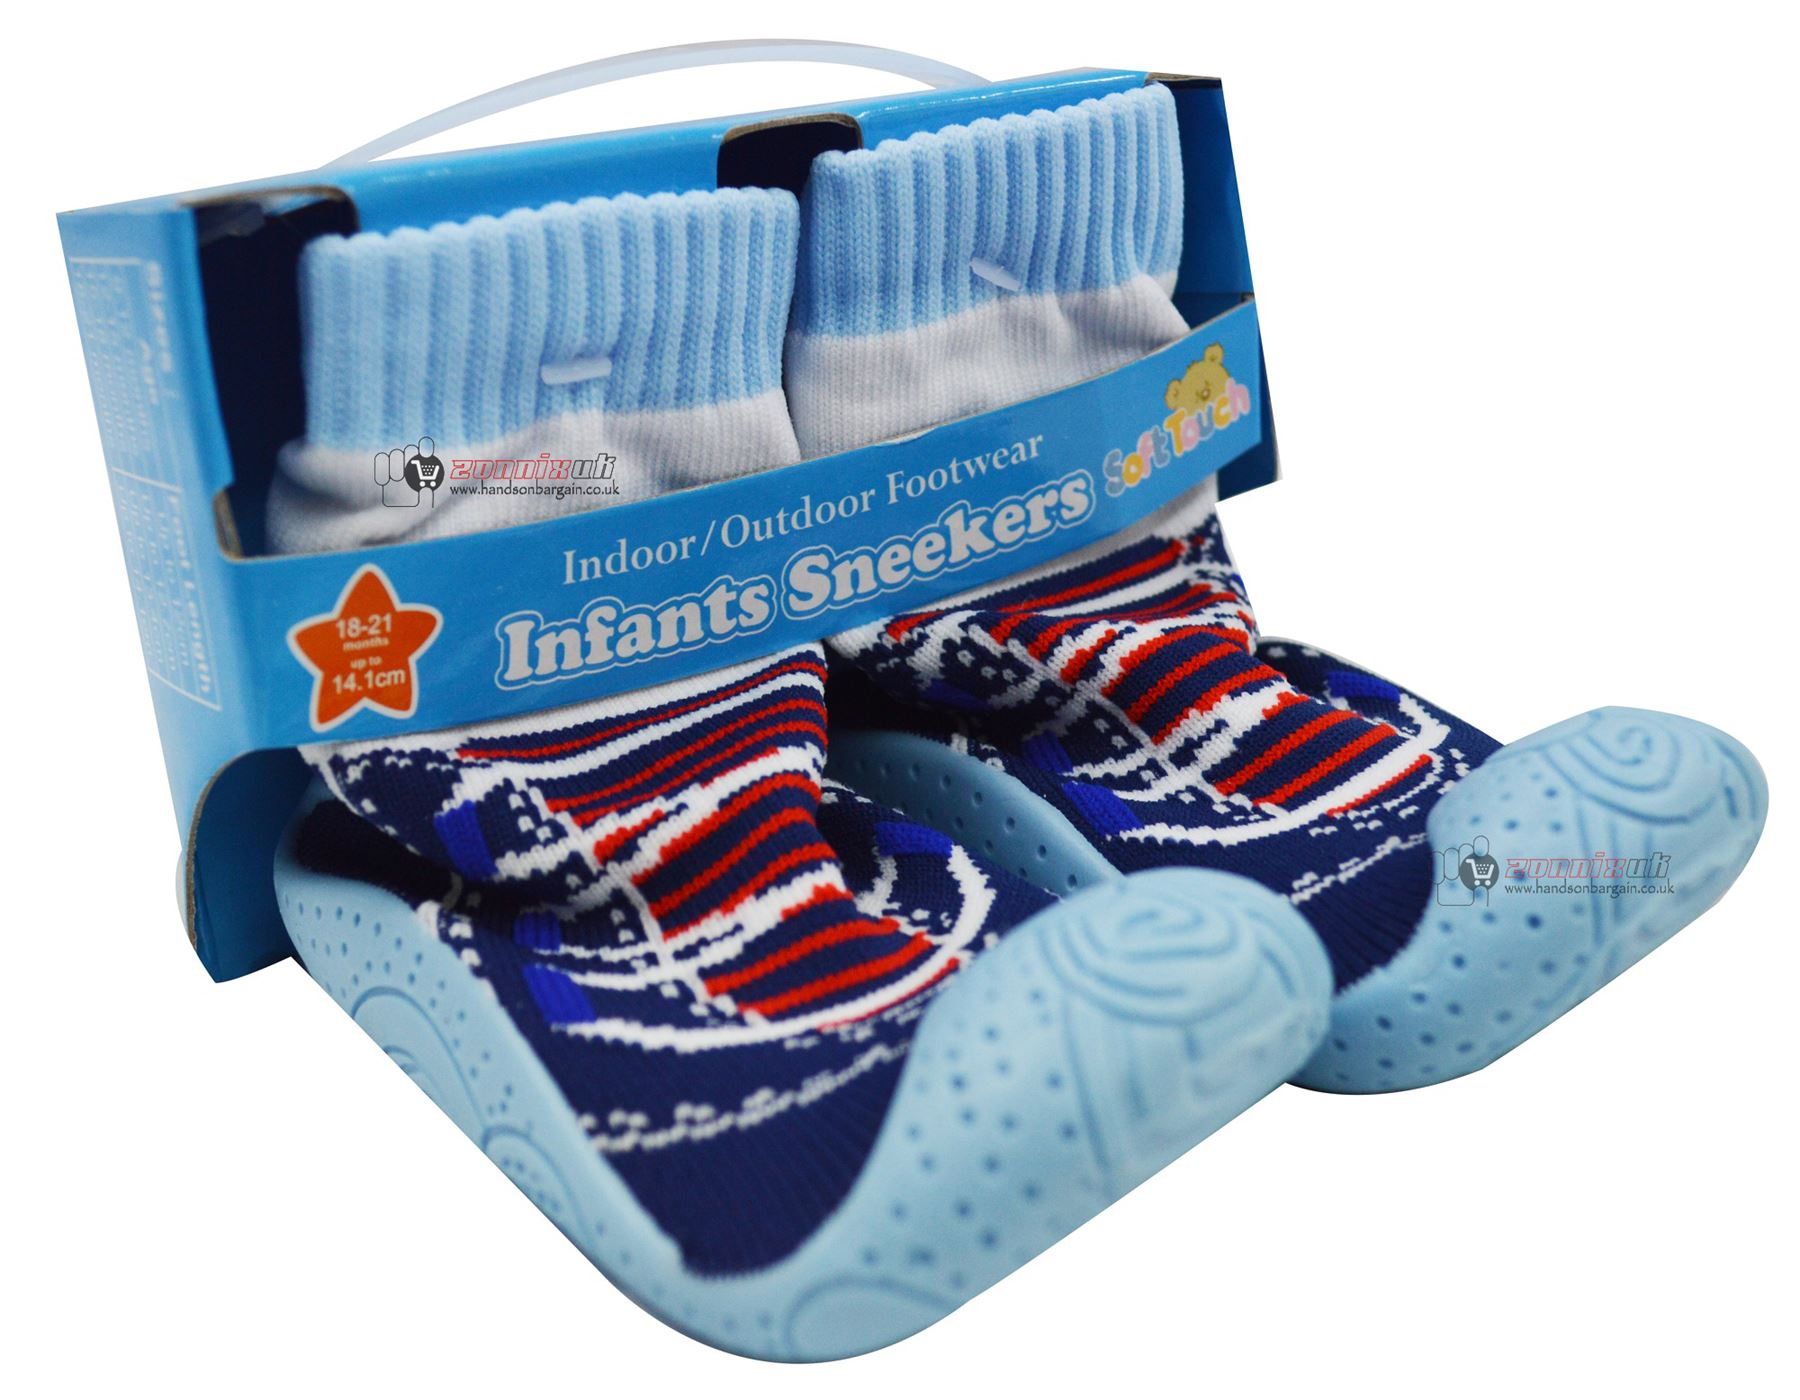 Baby Infant Sneekers Indoor Outdoor Footwear Rubber Soled Shoes Boys